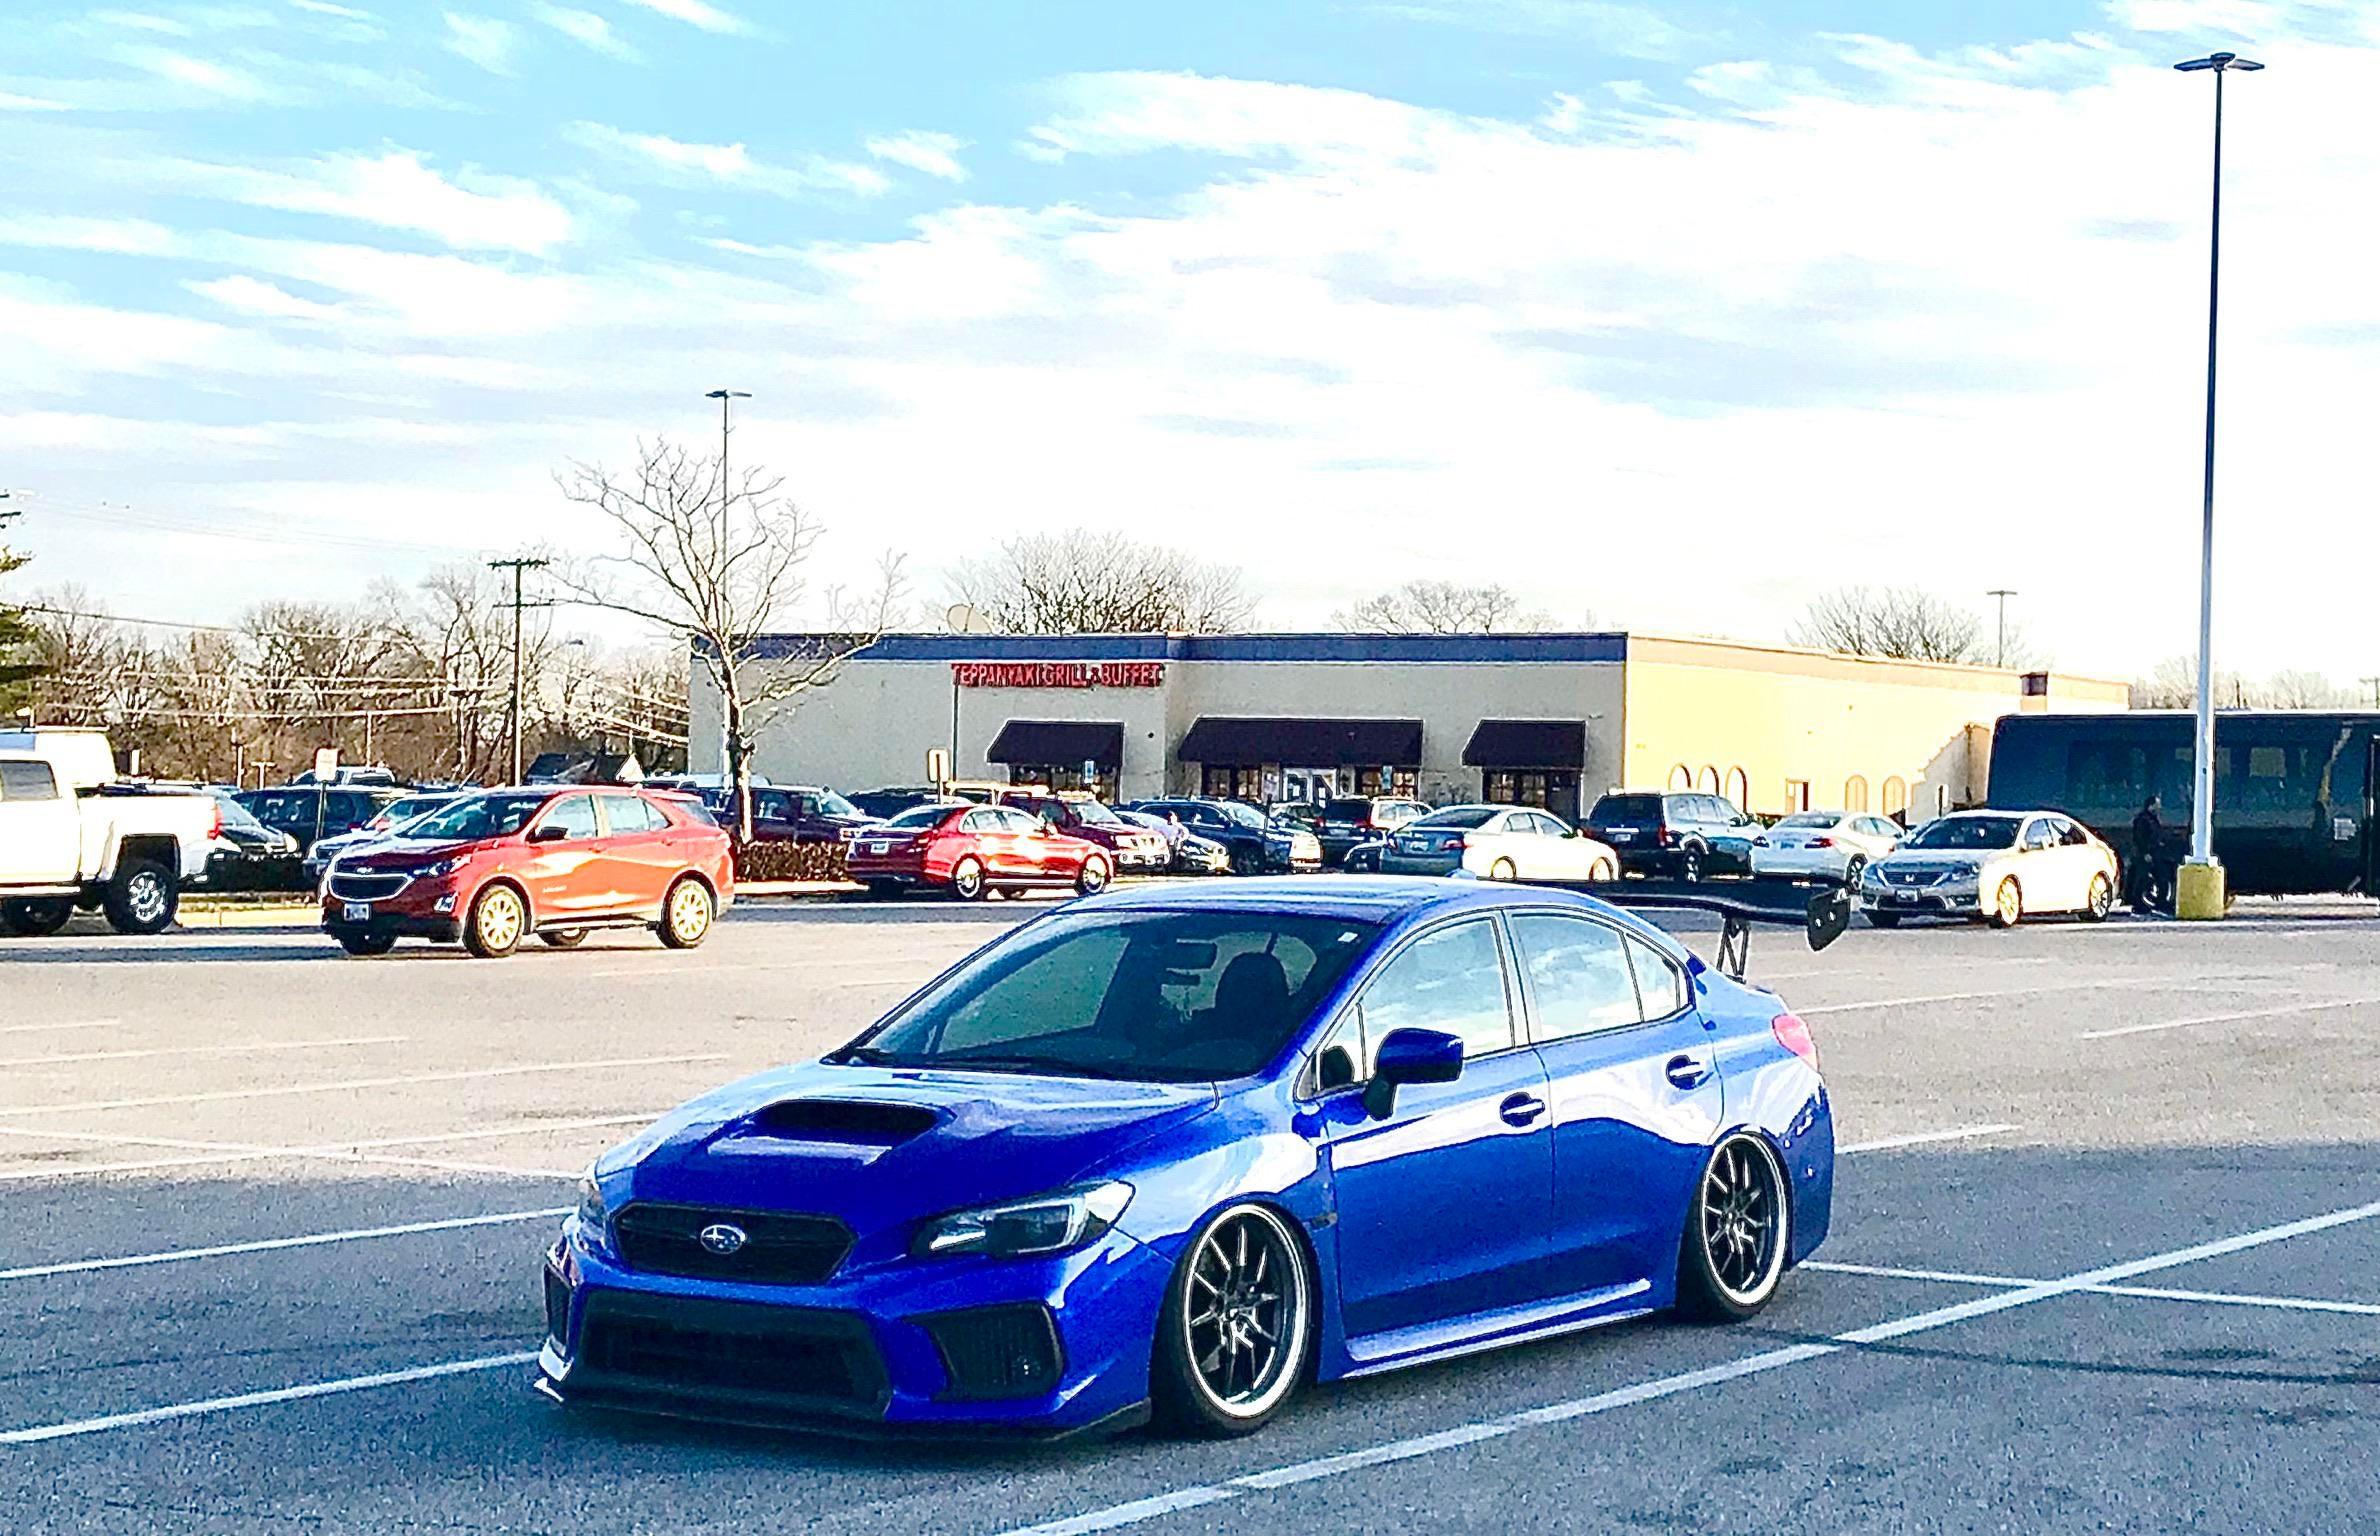 Subaru WRX in the wild